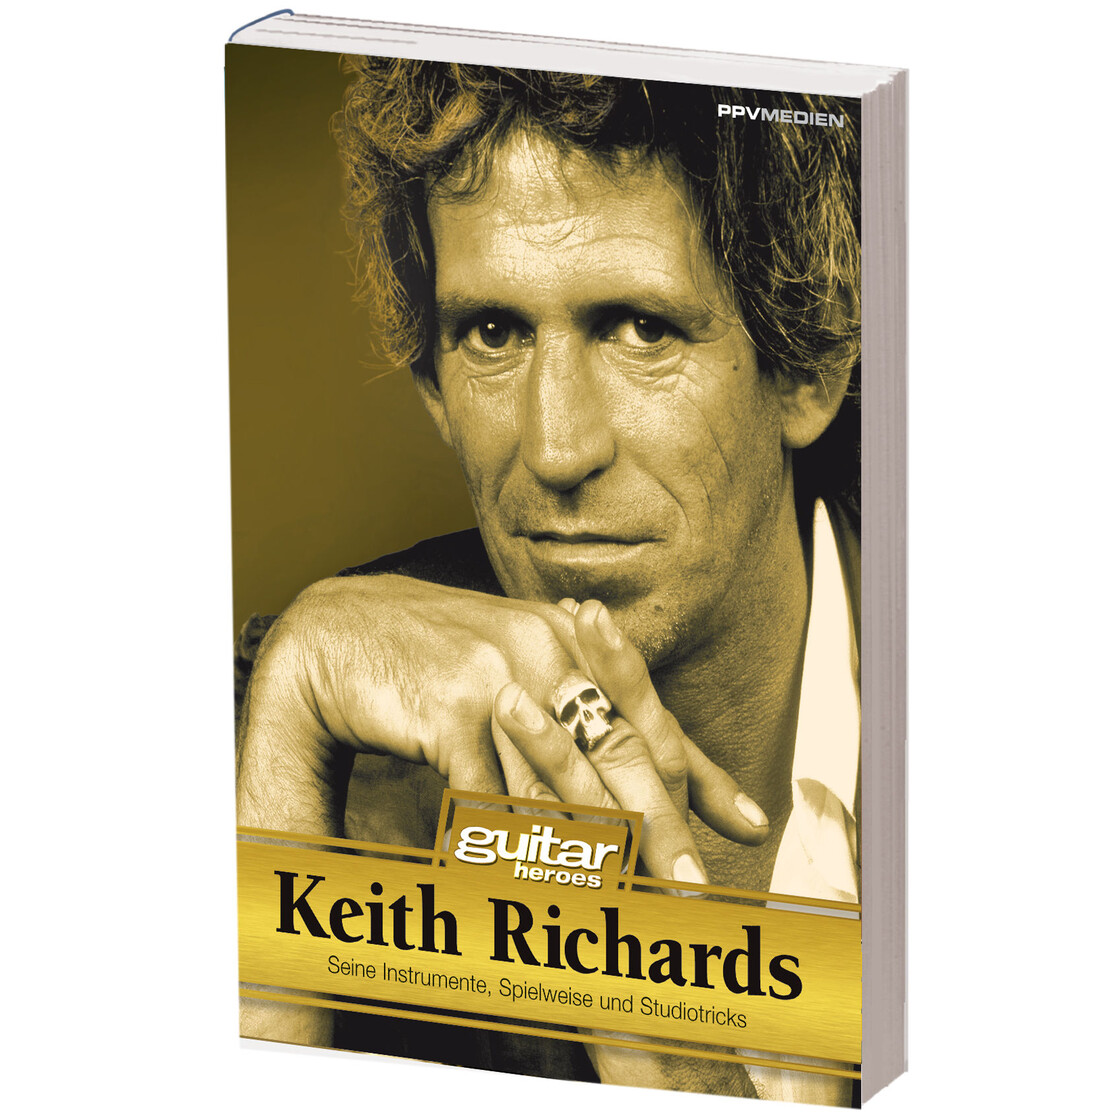 Guitar Heros Keith Richards